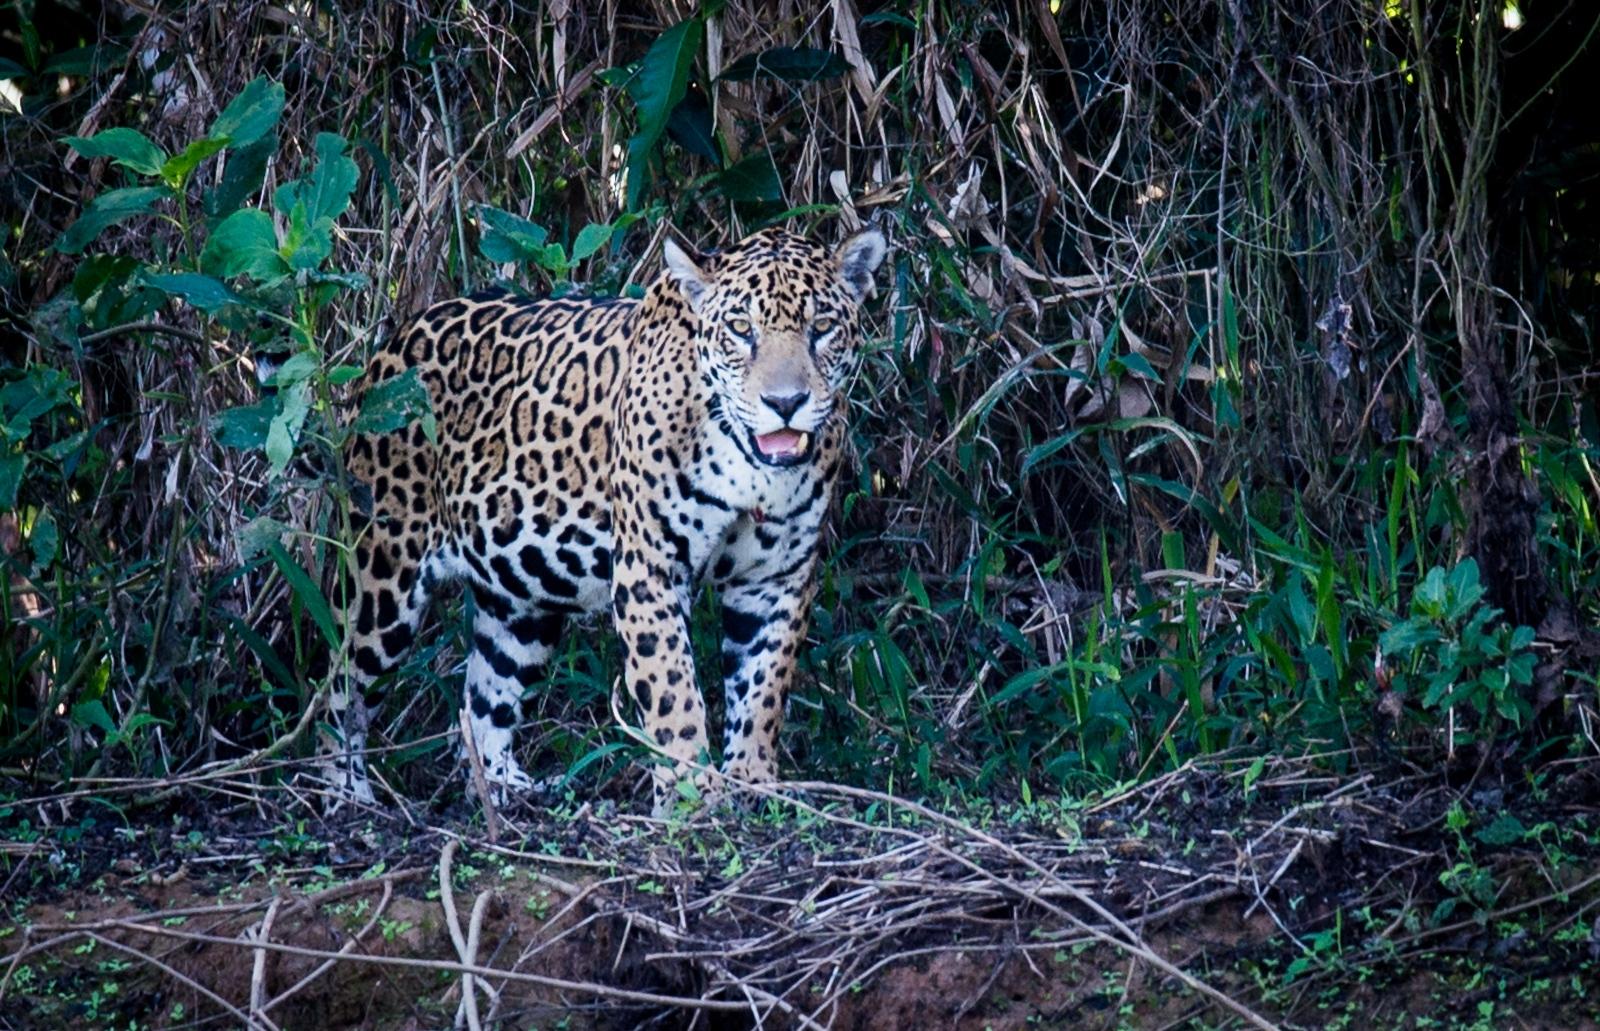 161-Jaguar